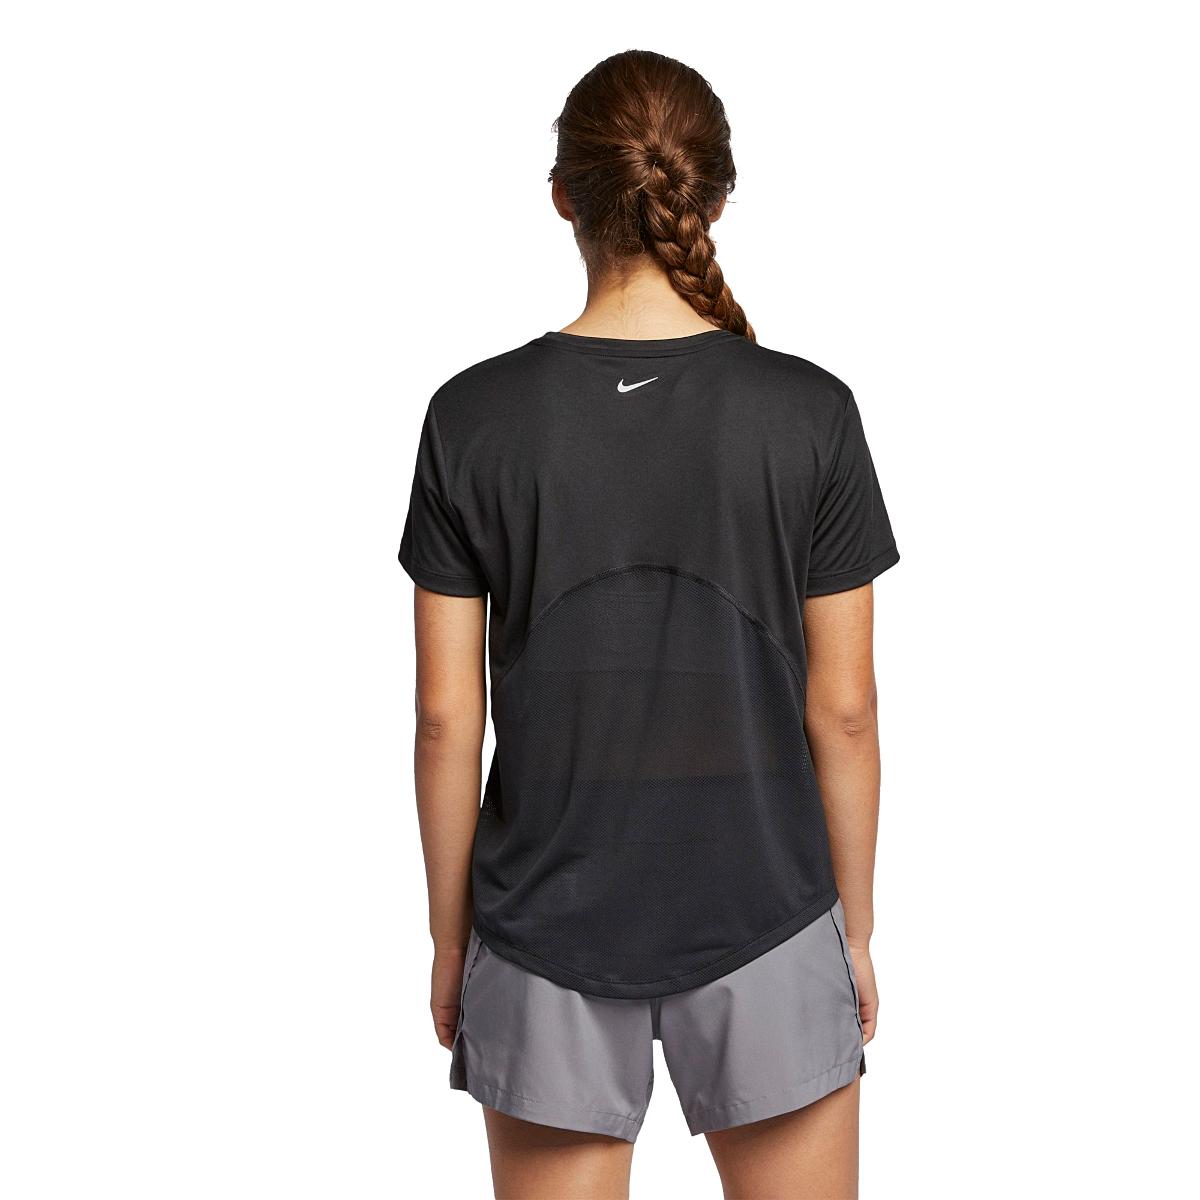 Women's Nike Miler Short Sleeve - Color: Black - Size: XS - Width:, Black, large, image 2